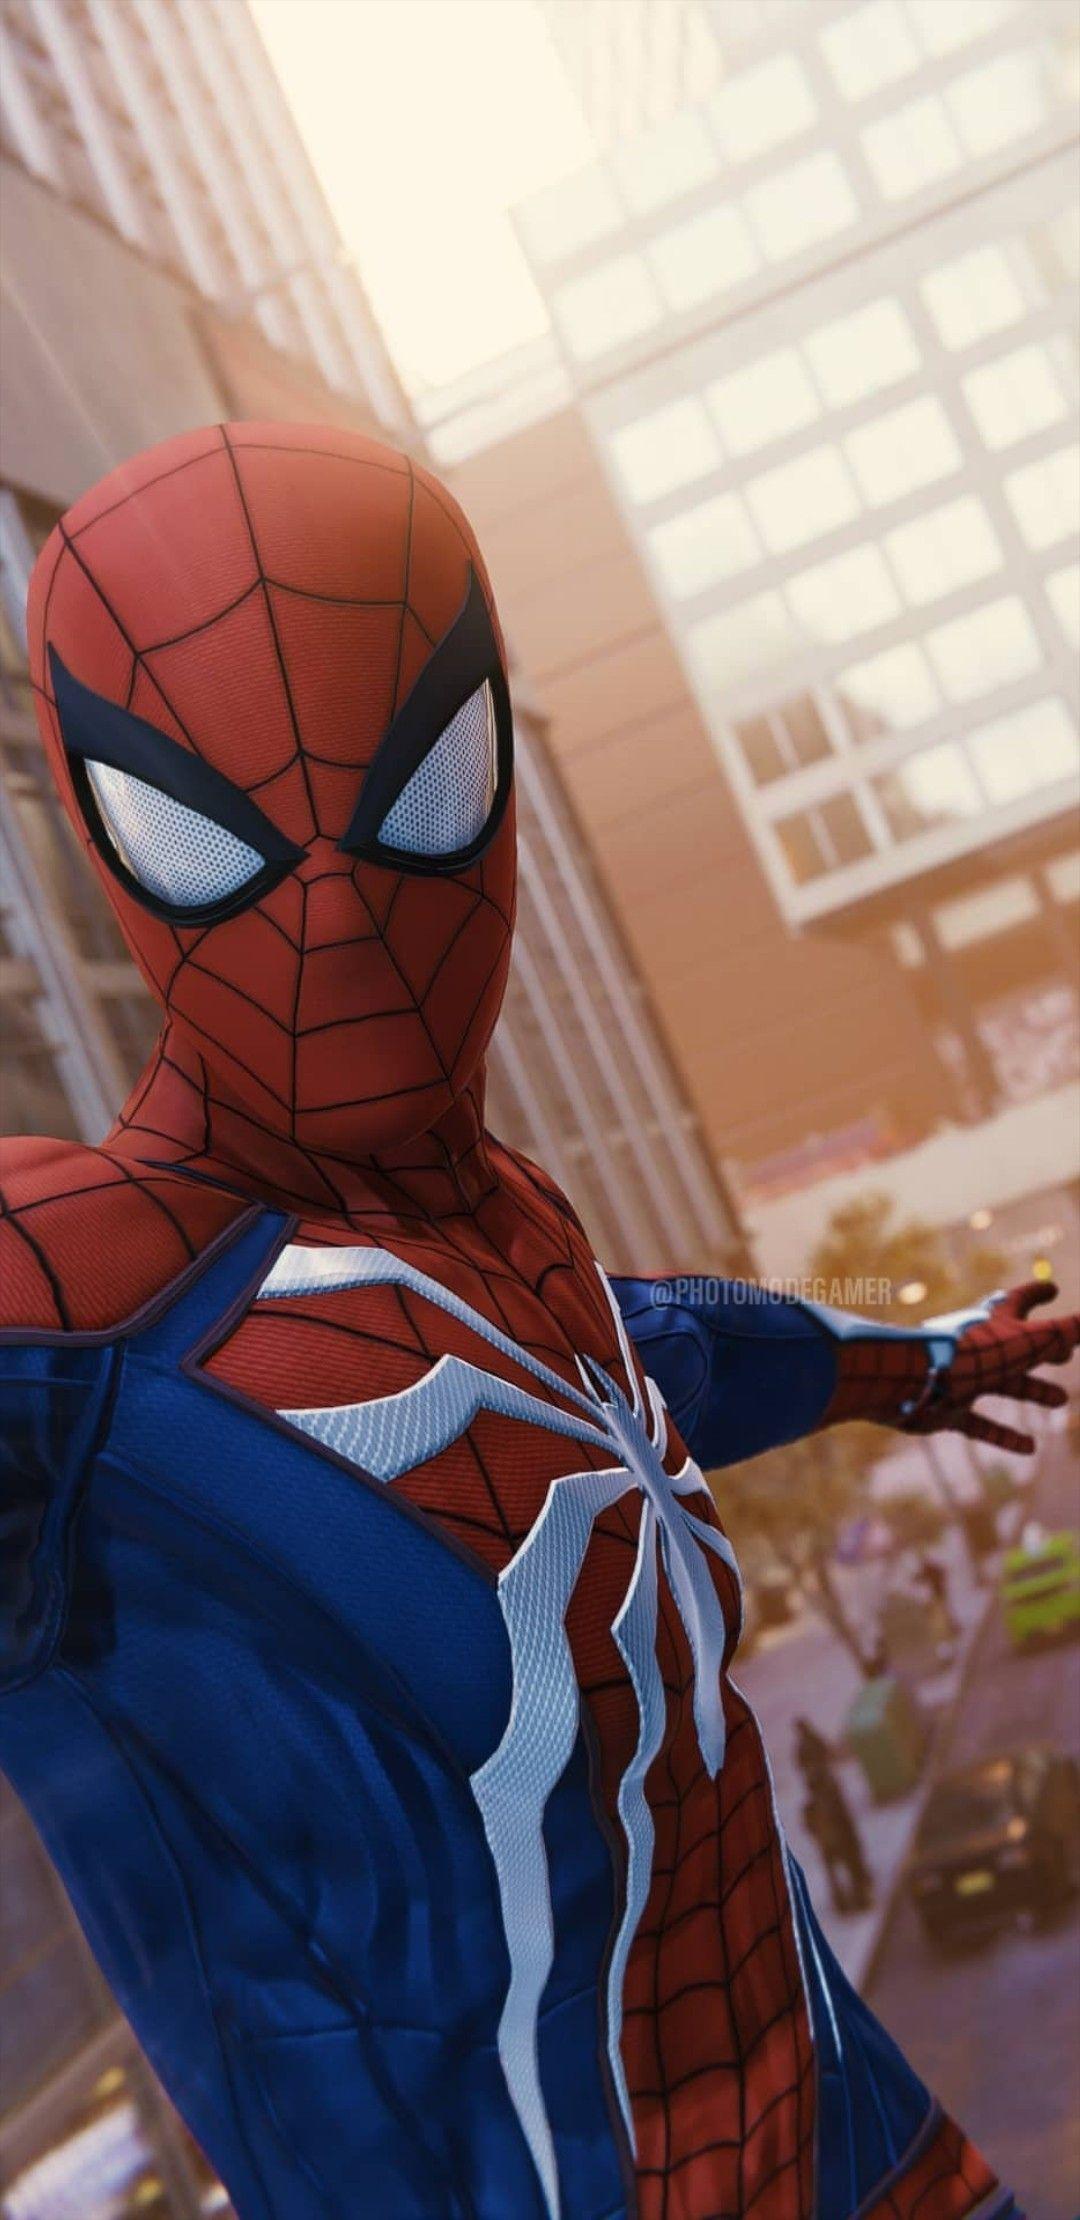 wallpaper Spiderman, Marvel spiderman, Best marvel